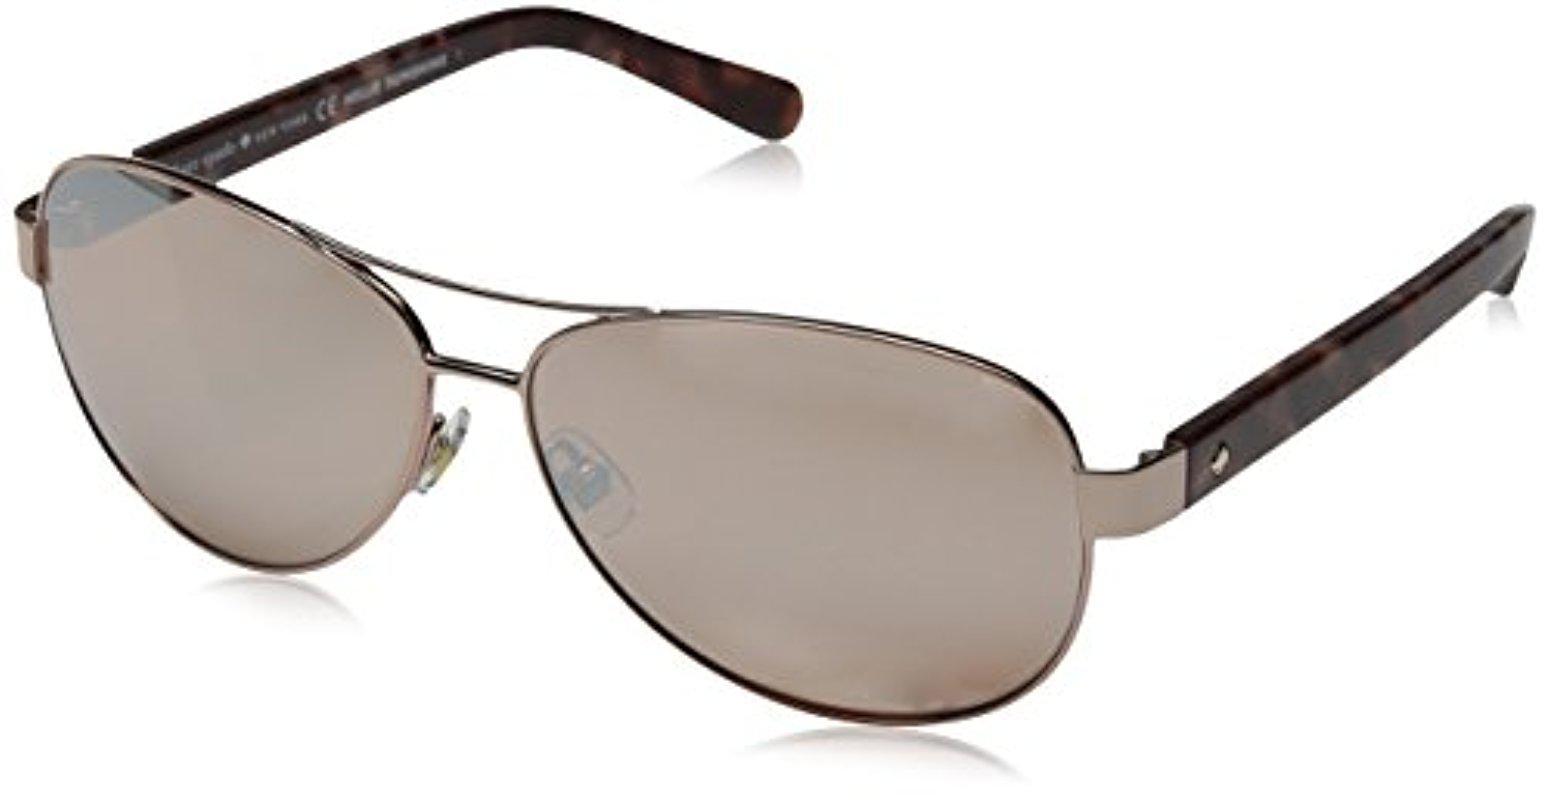 6ff2b977a1c Kate Spade. Women s Kate Spade Dalia 2 Aviator Sunglasses ...